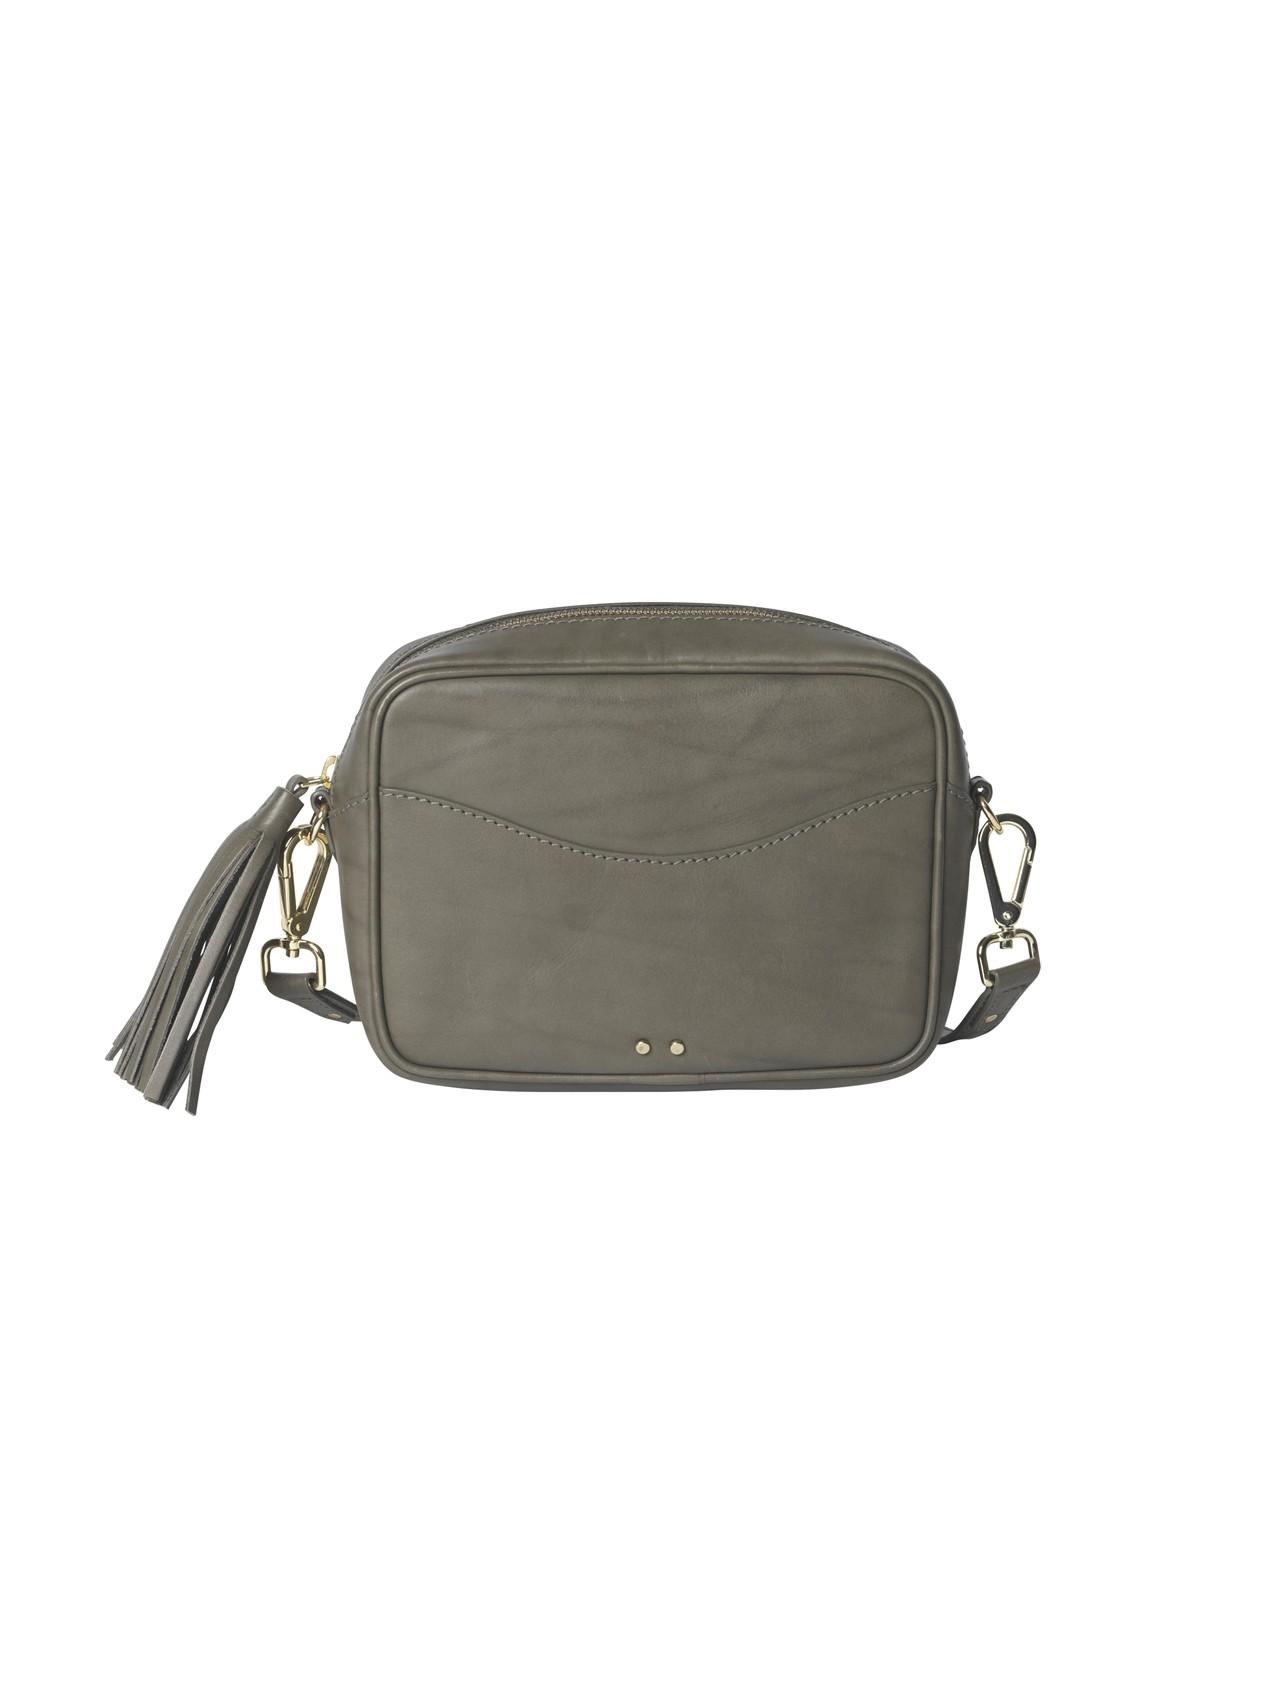 Becksondergaard Leather Pippa Bag Army Green